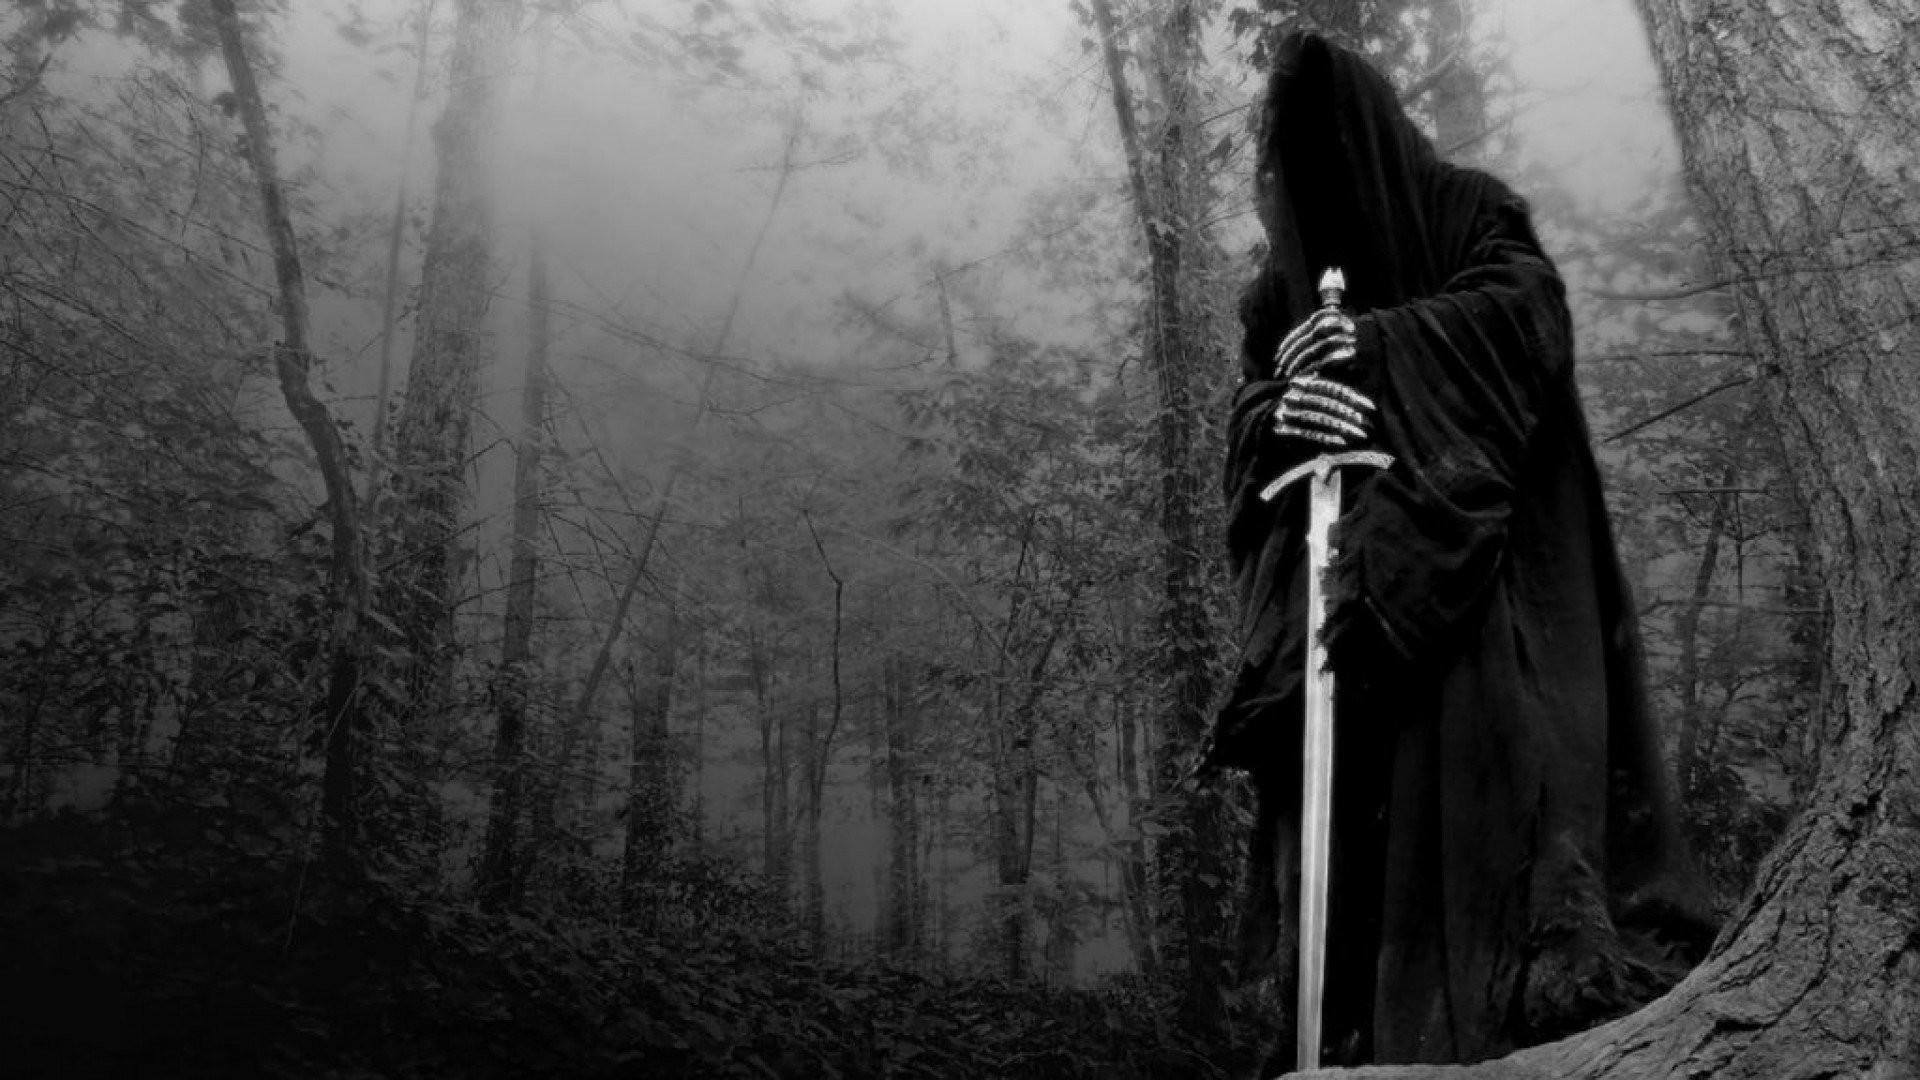 Dark Gothic Death Sword Wallpaper At Dark Wallpapers 1920x1080